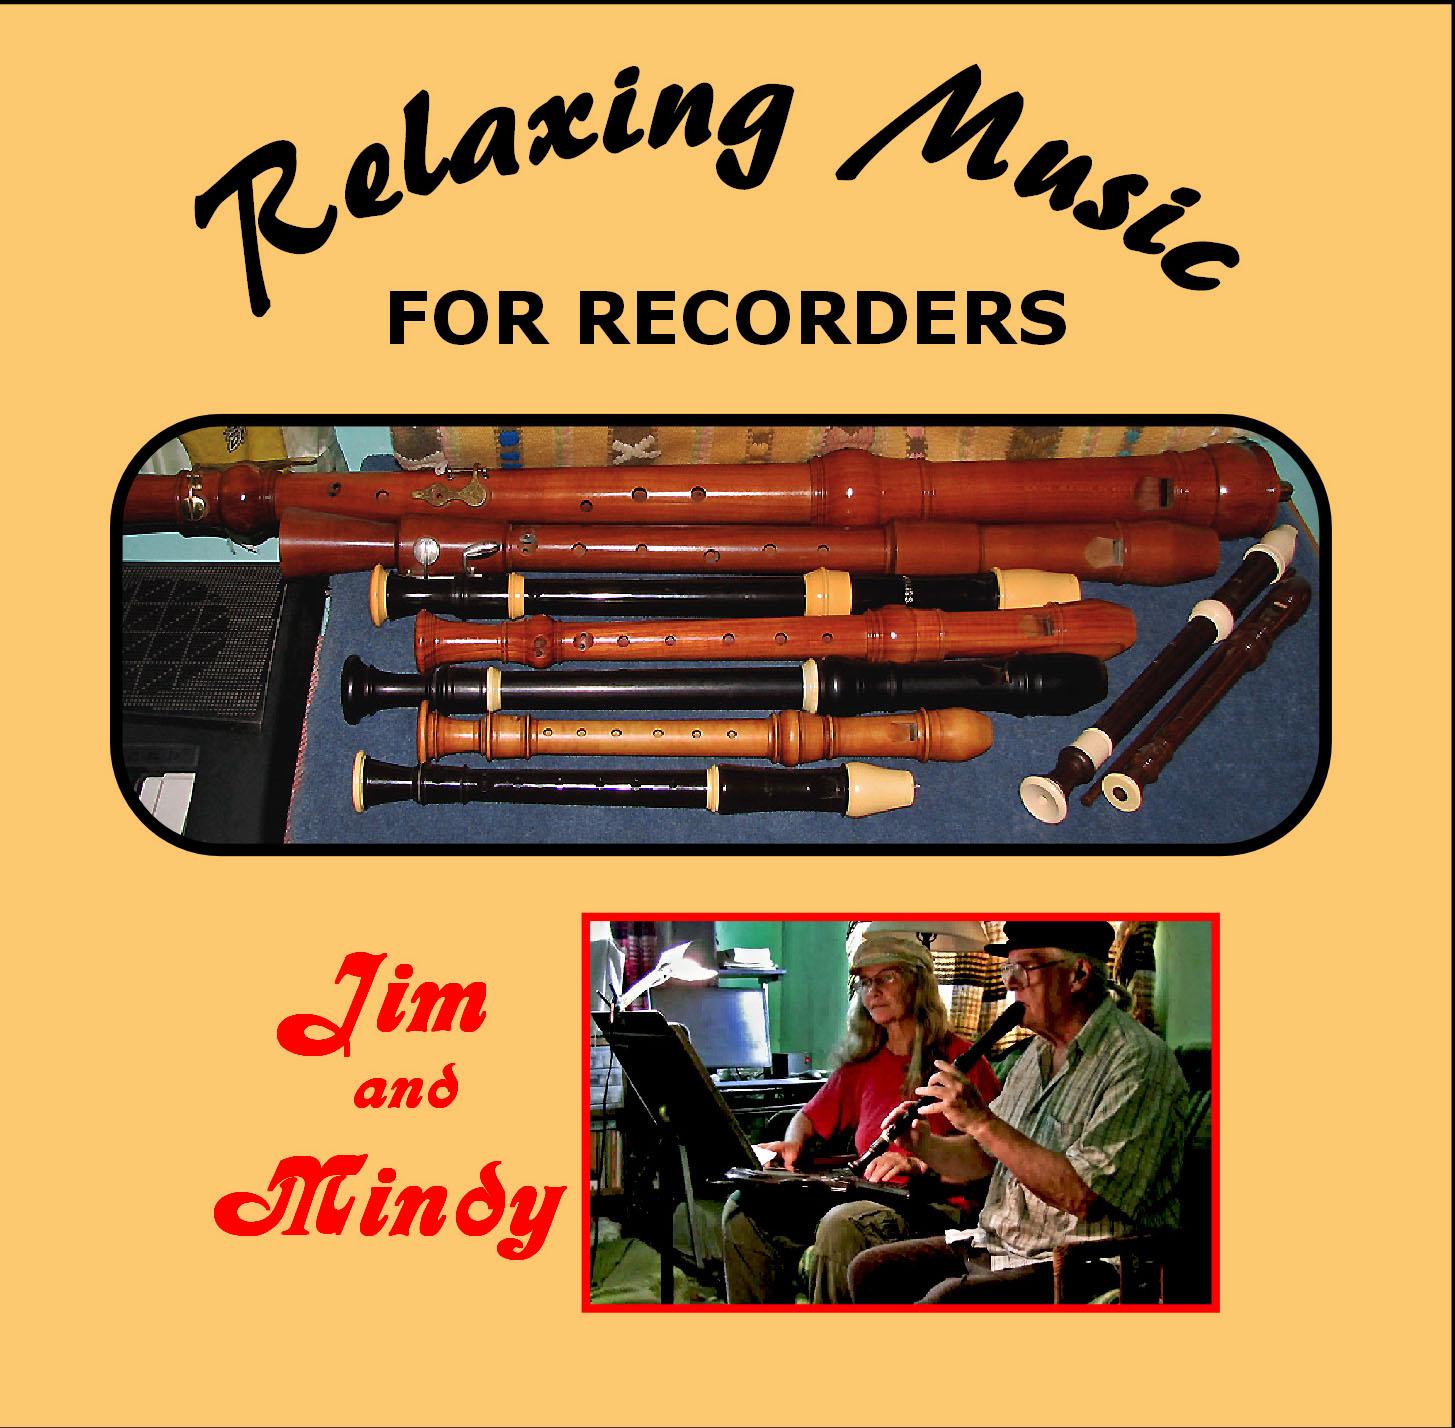 music recorders: